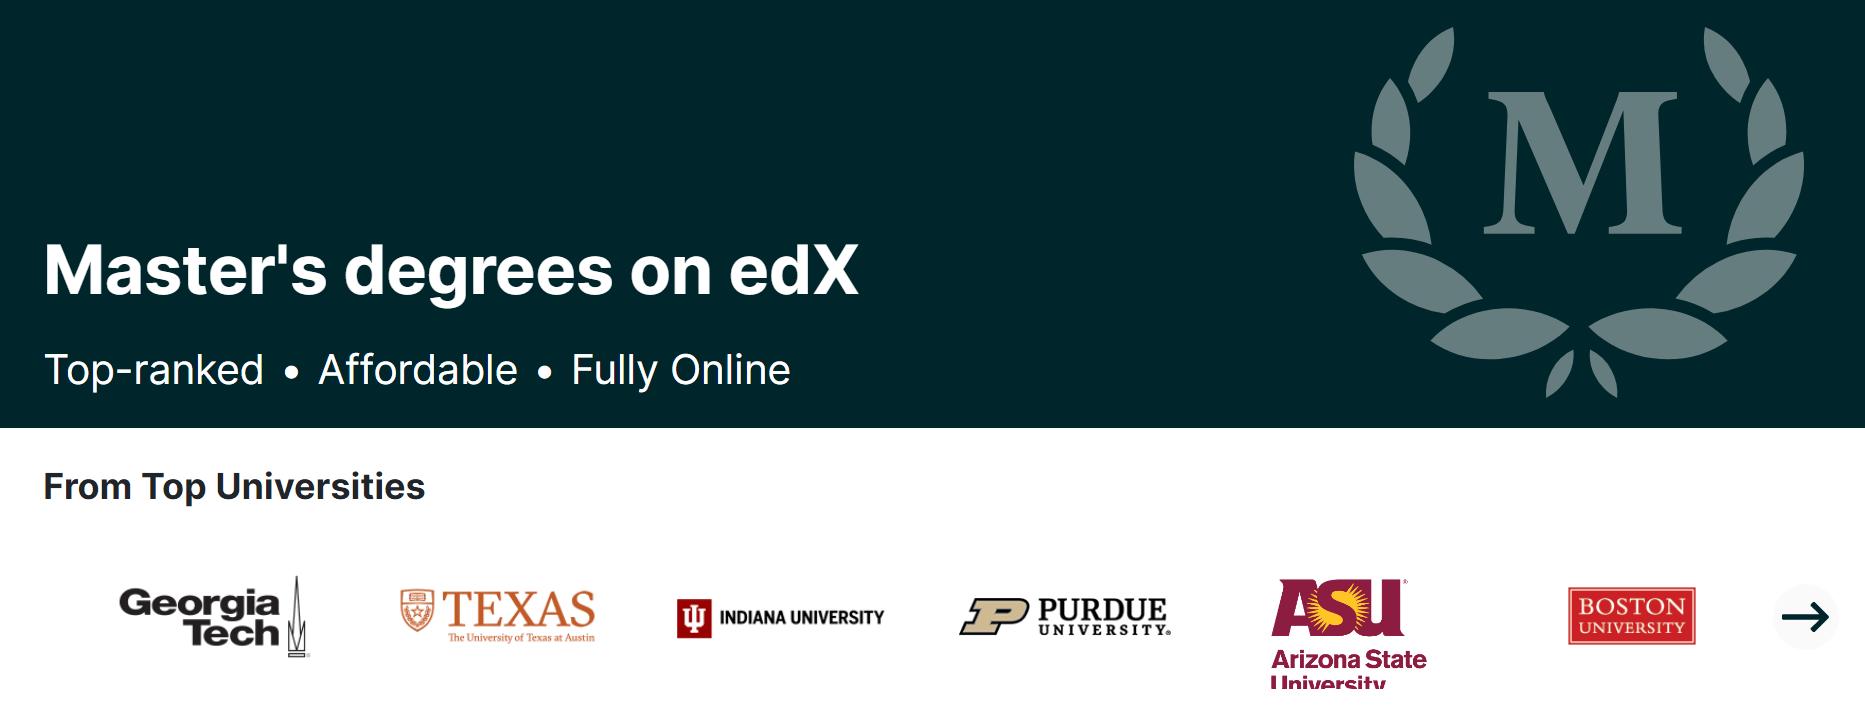 edx masters